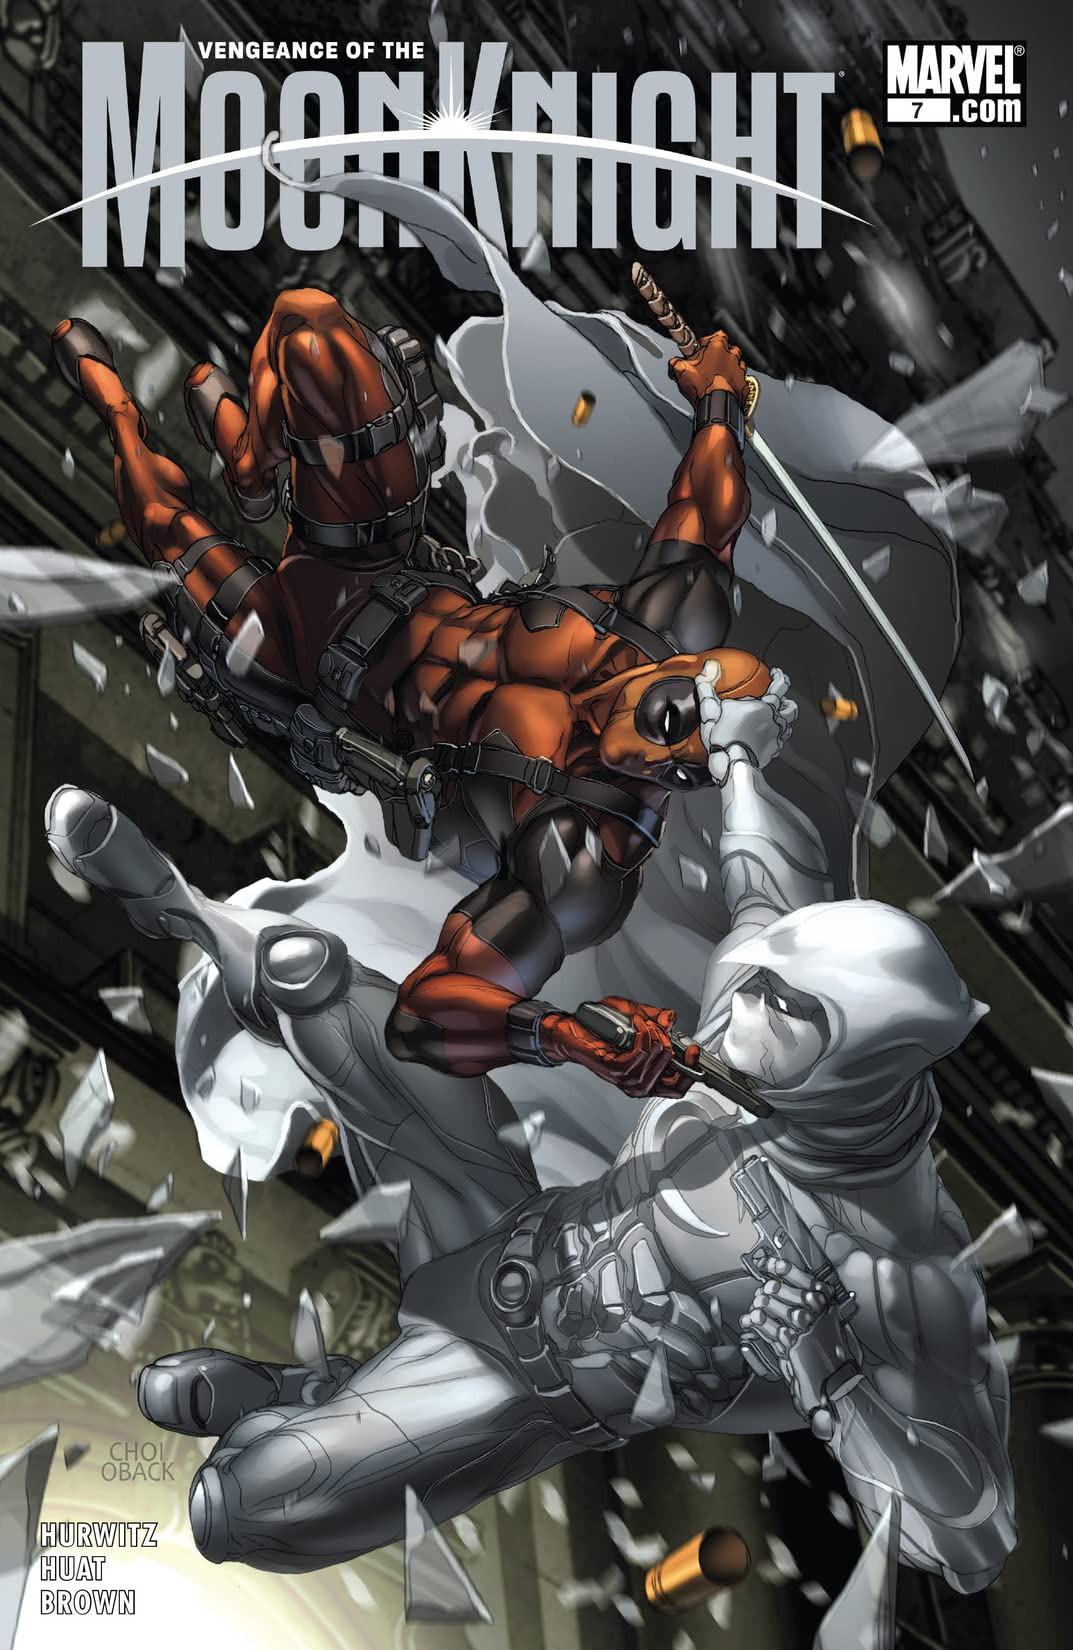 Vengeance of the Moon Knight Vol 1 7